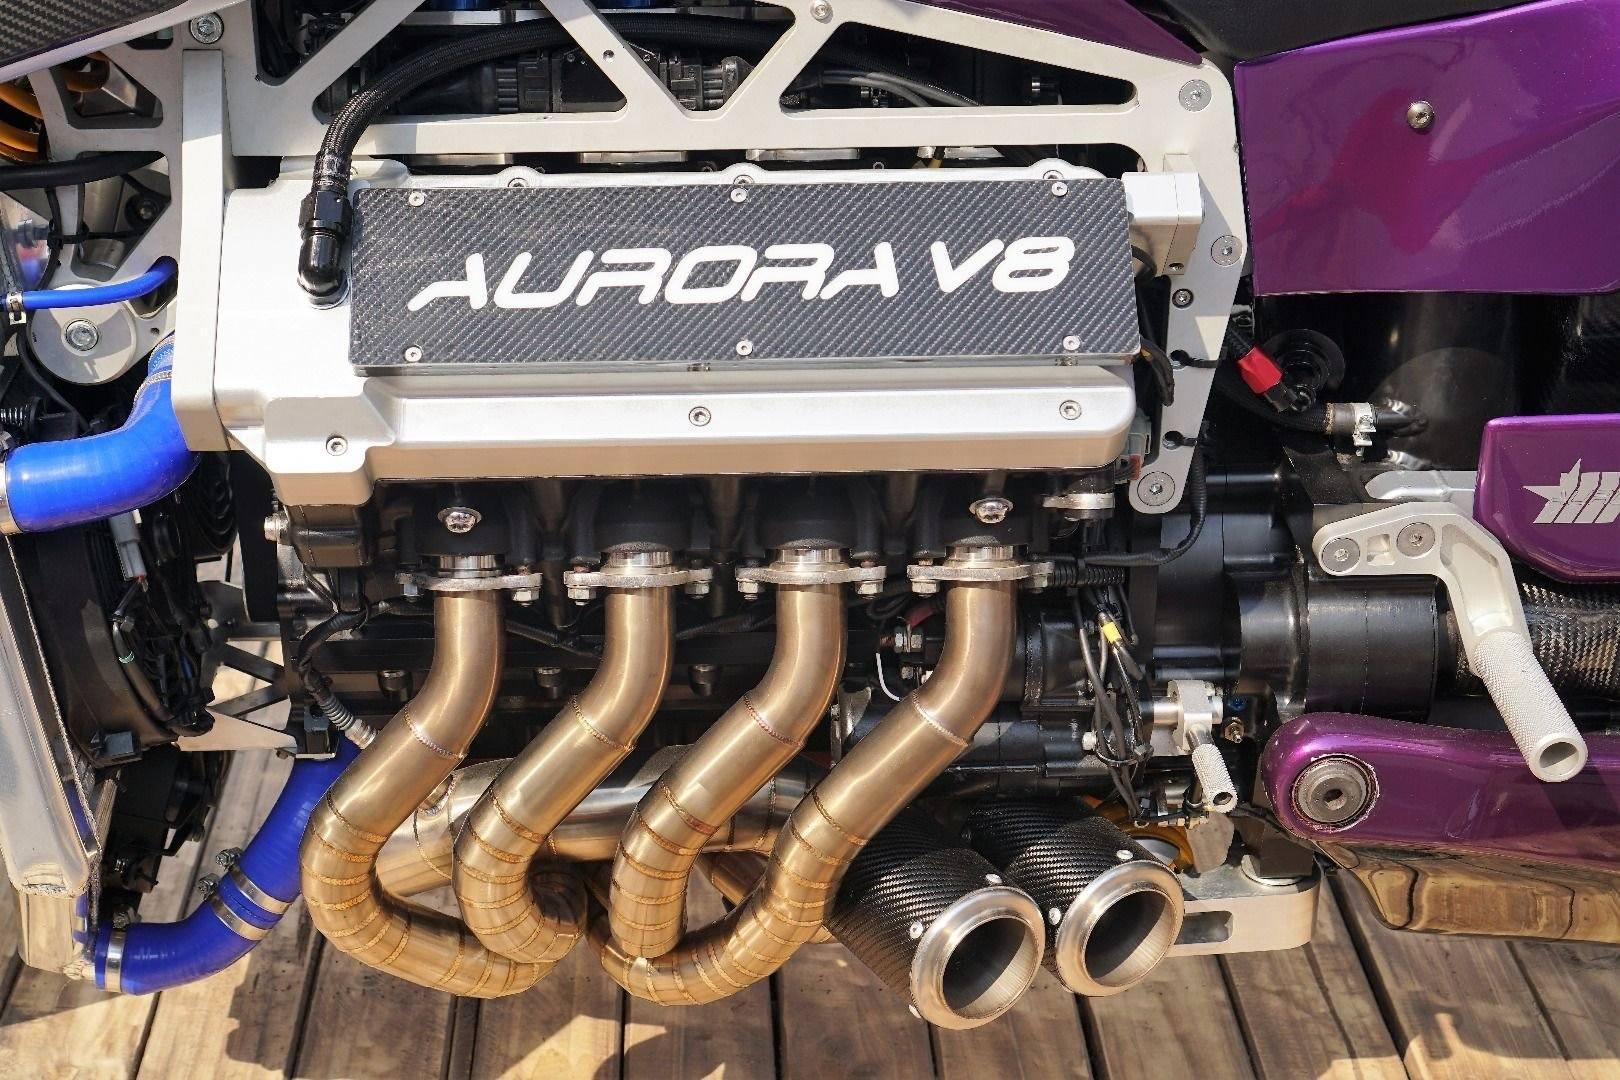 Aurora Hellfire OZ26 V8 05